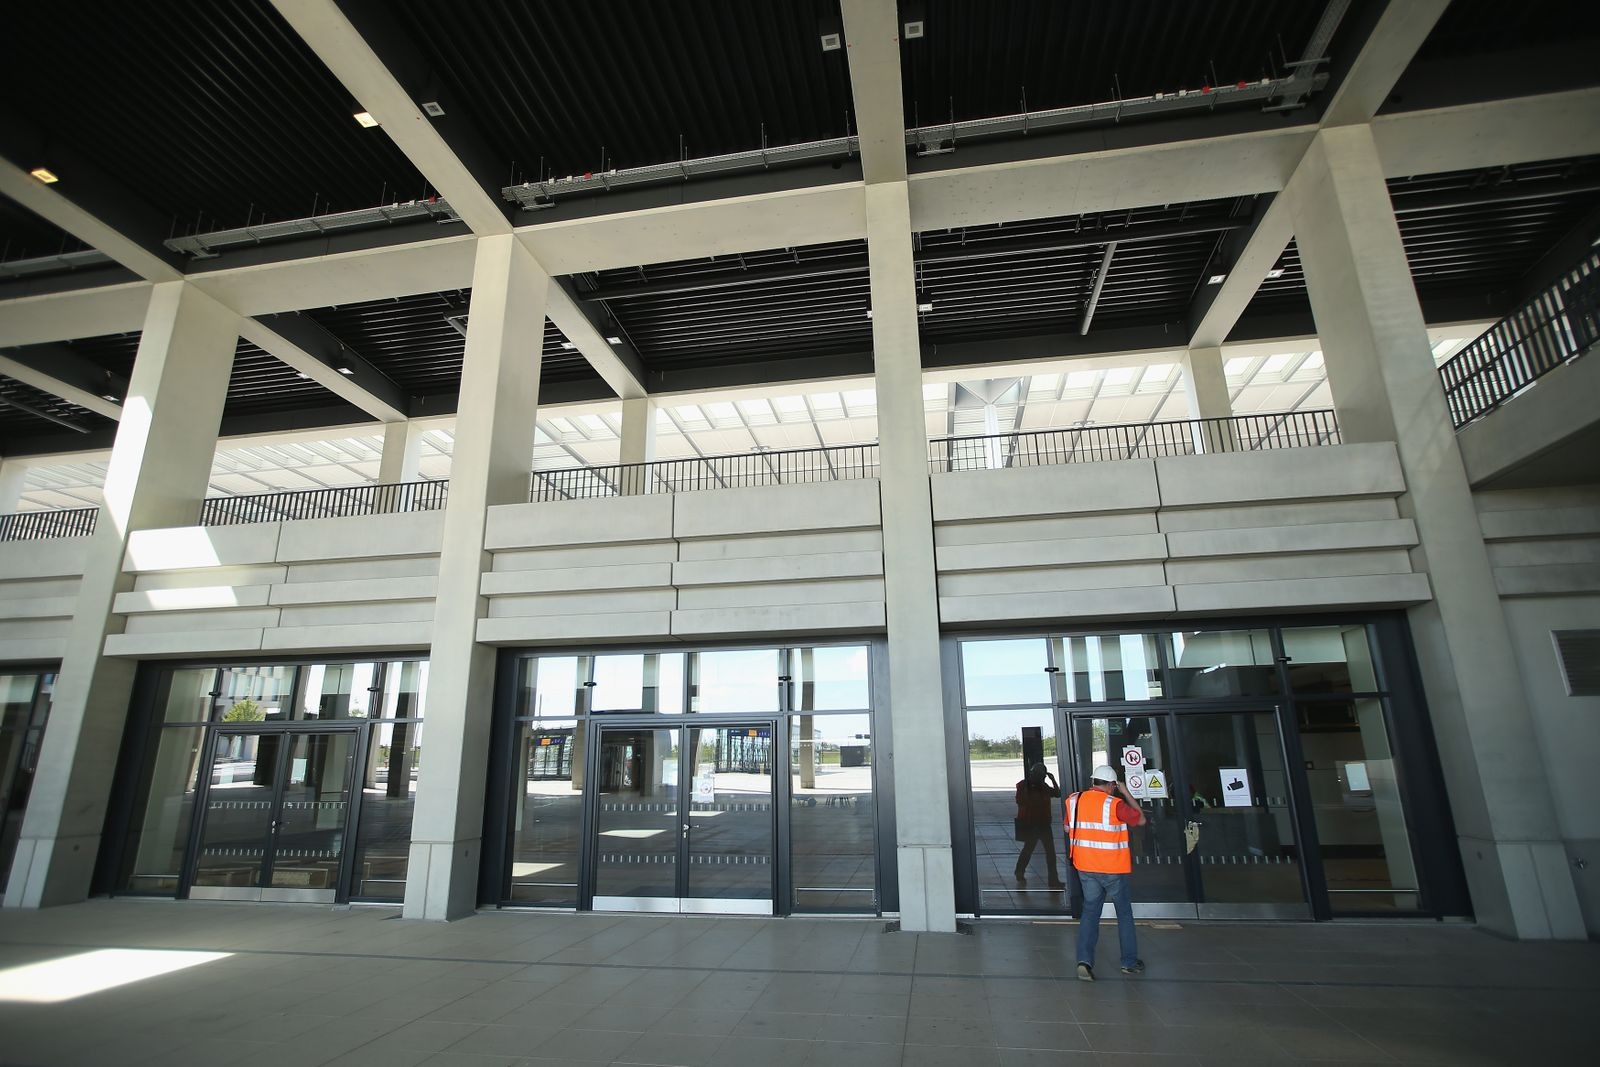 BER / Flughafen / Türen / Eingang